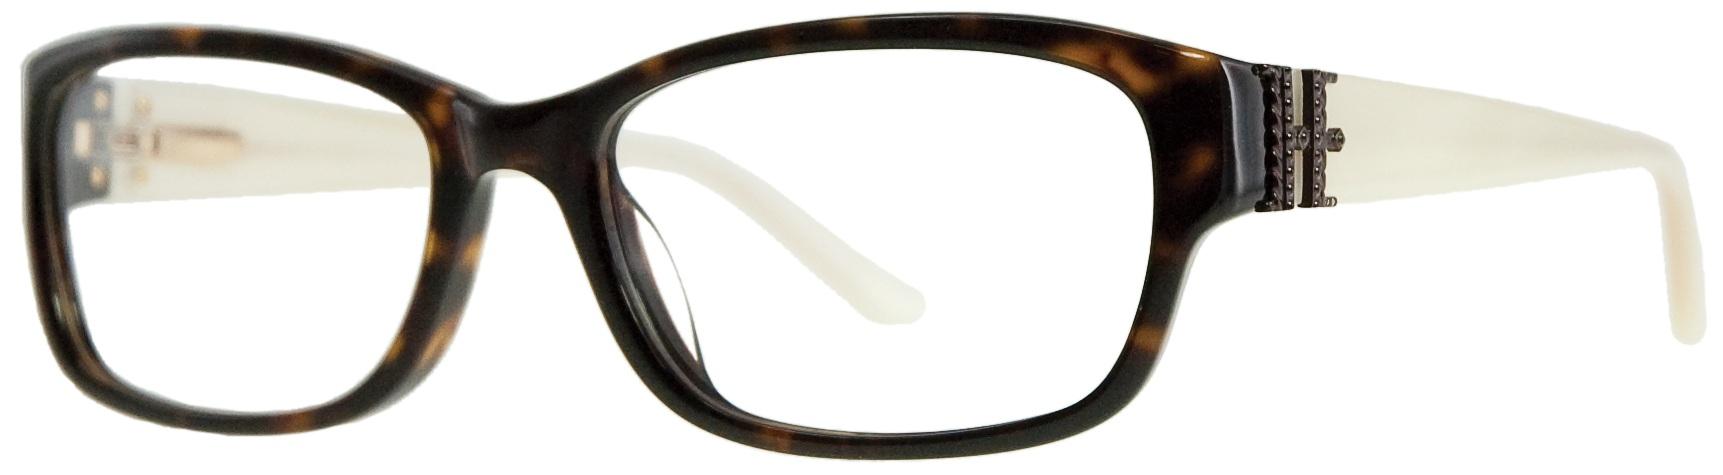 helium paris eyewear 4207